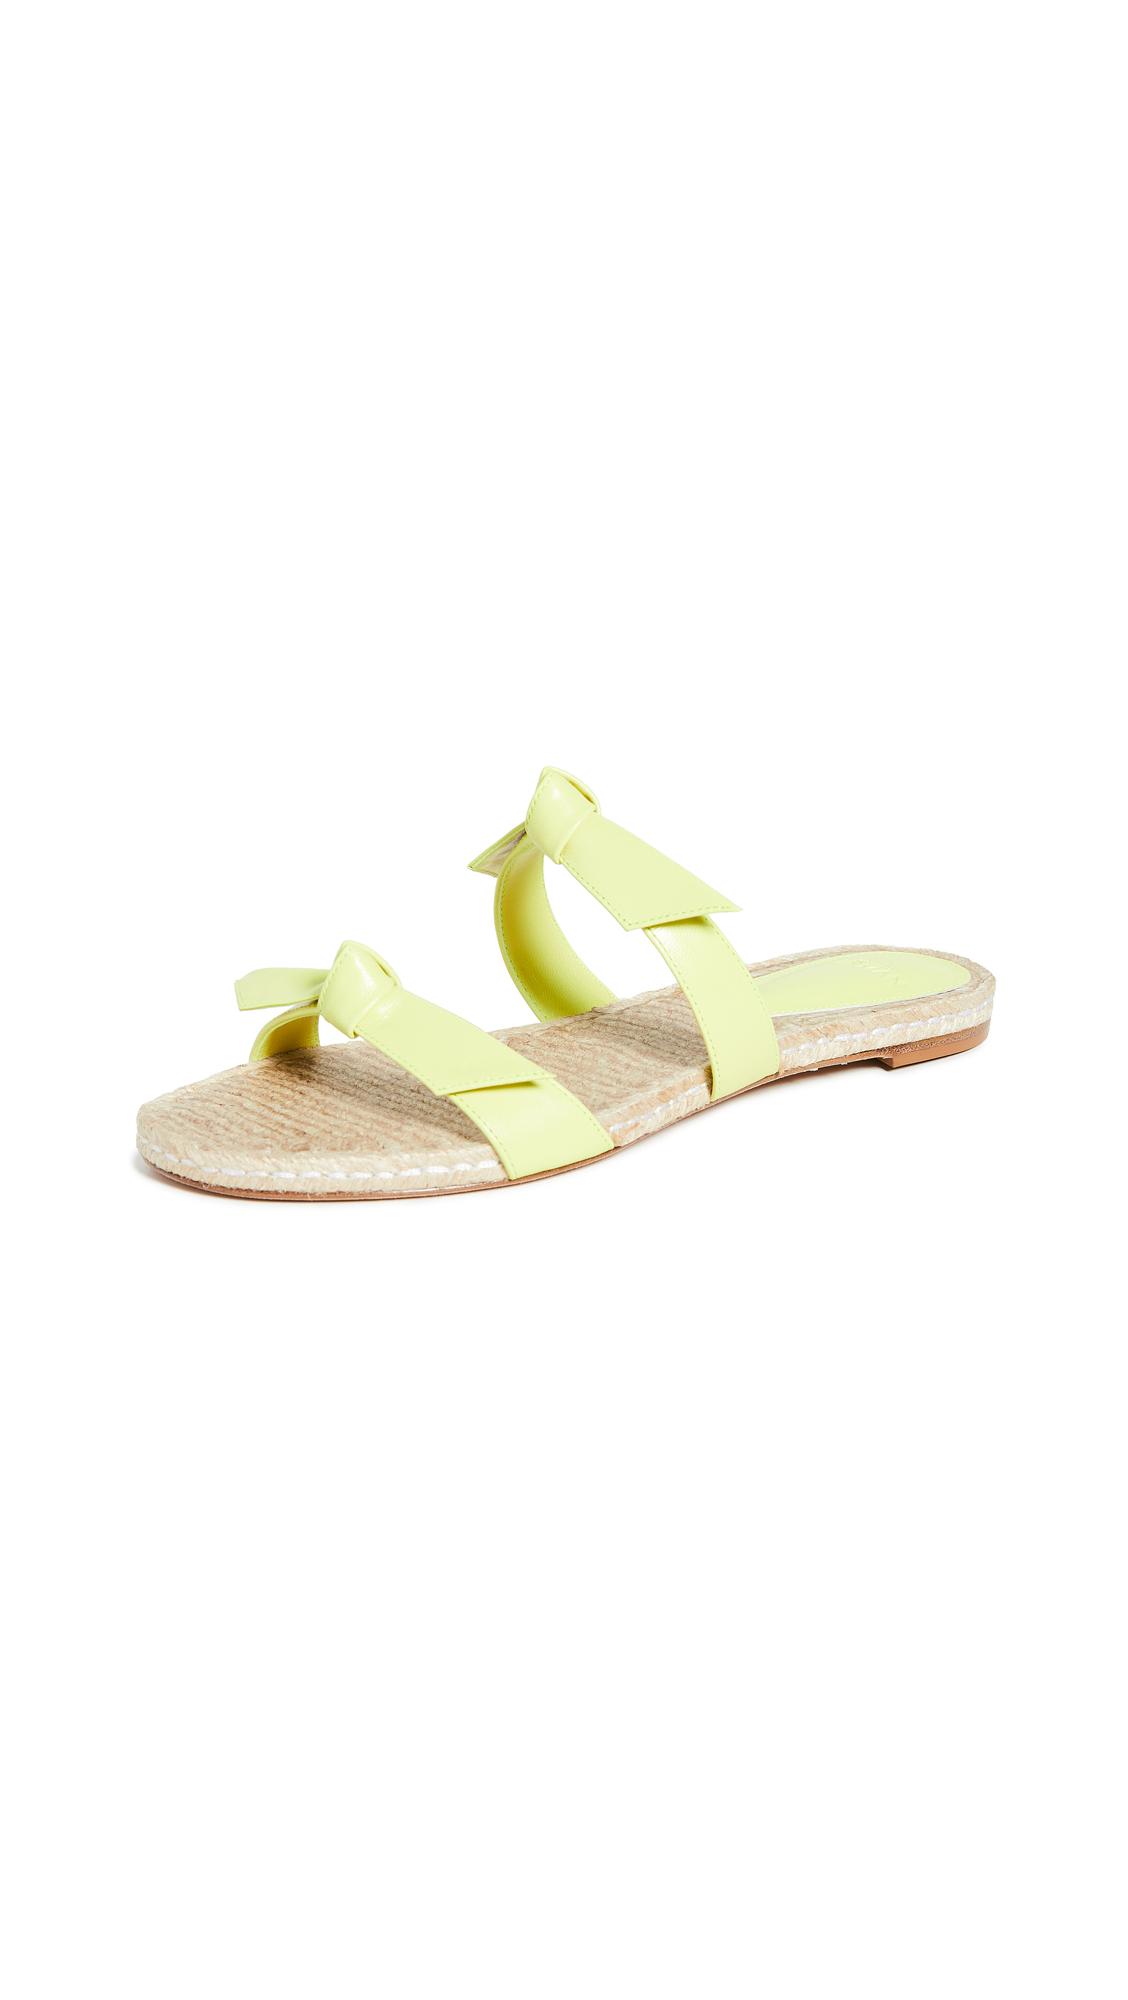 Buy Alexandre Birman Clarita Braided Flat Slides online, shop Alexandre Birman